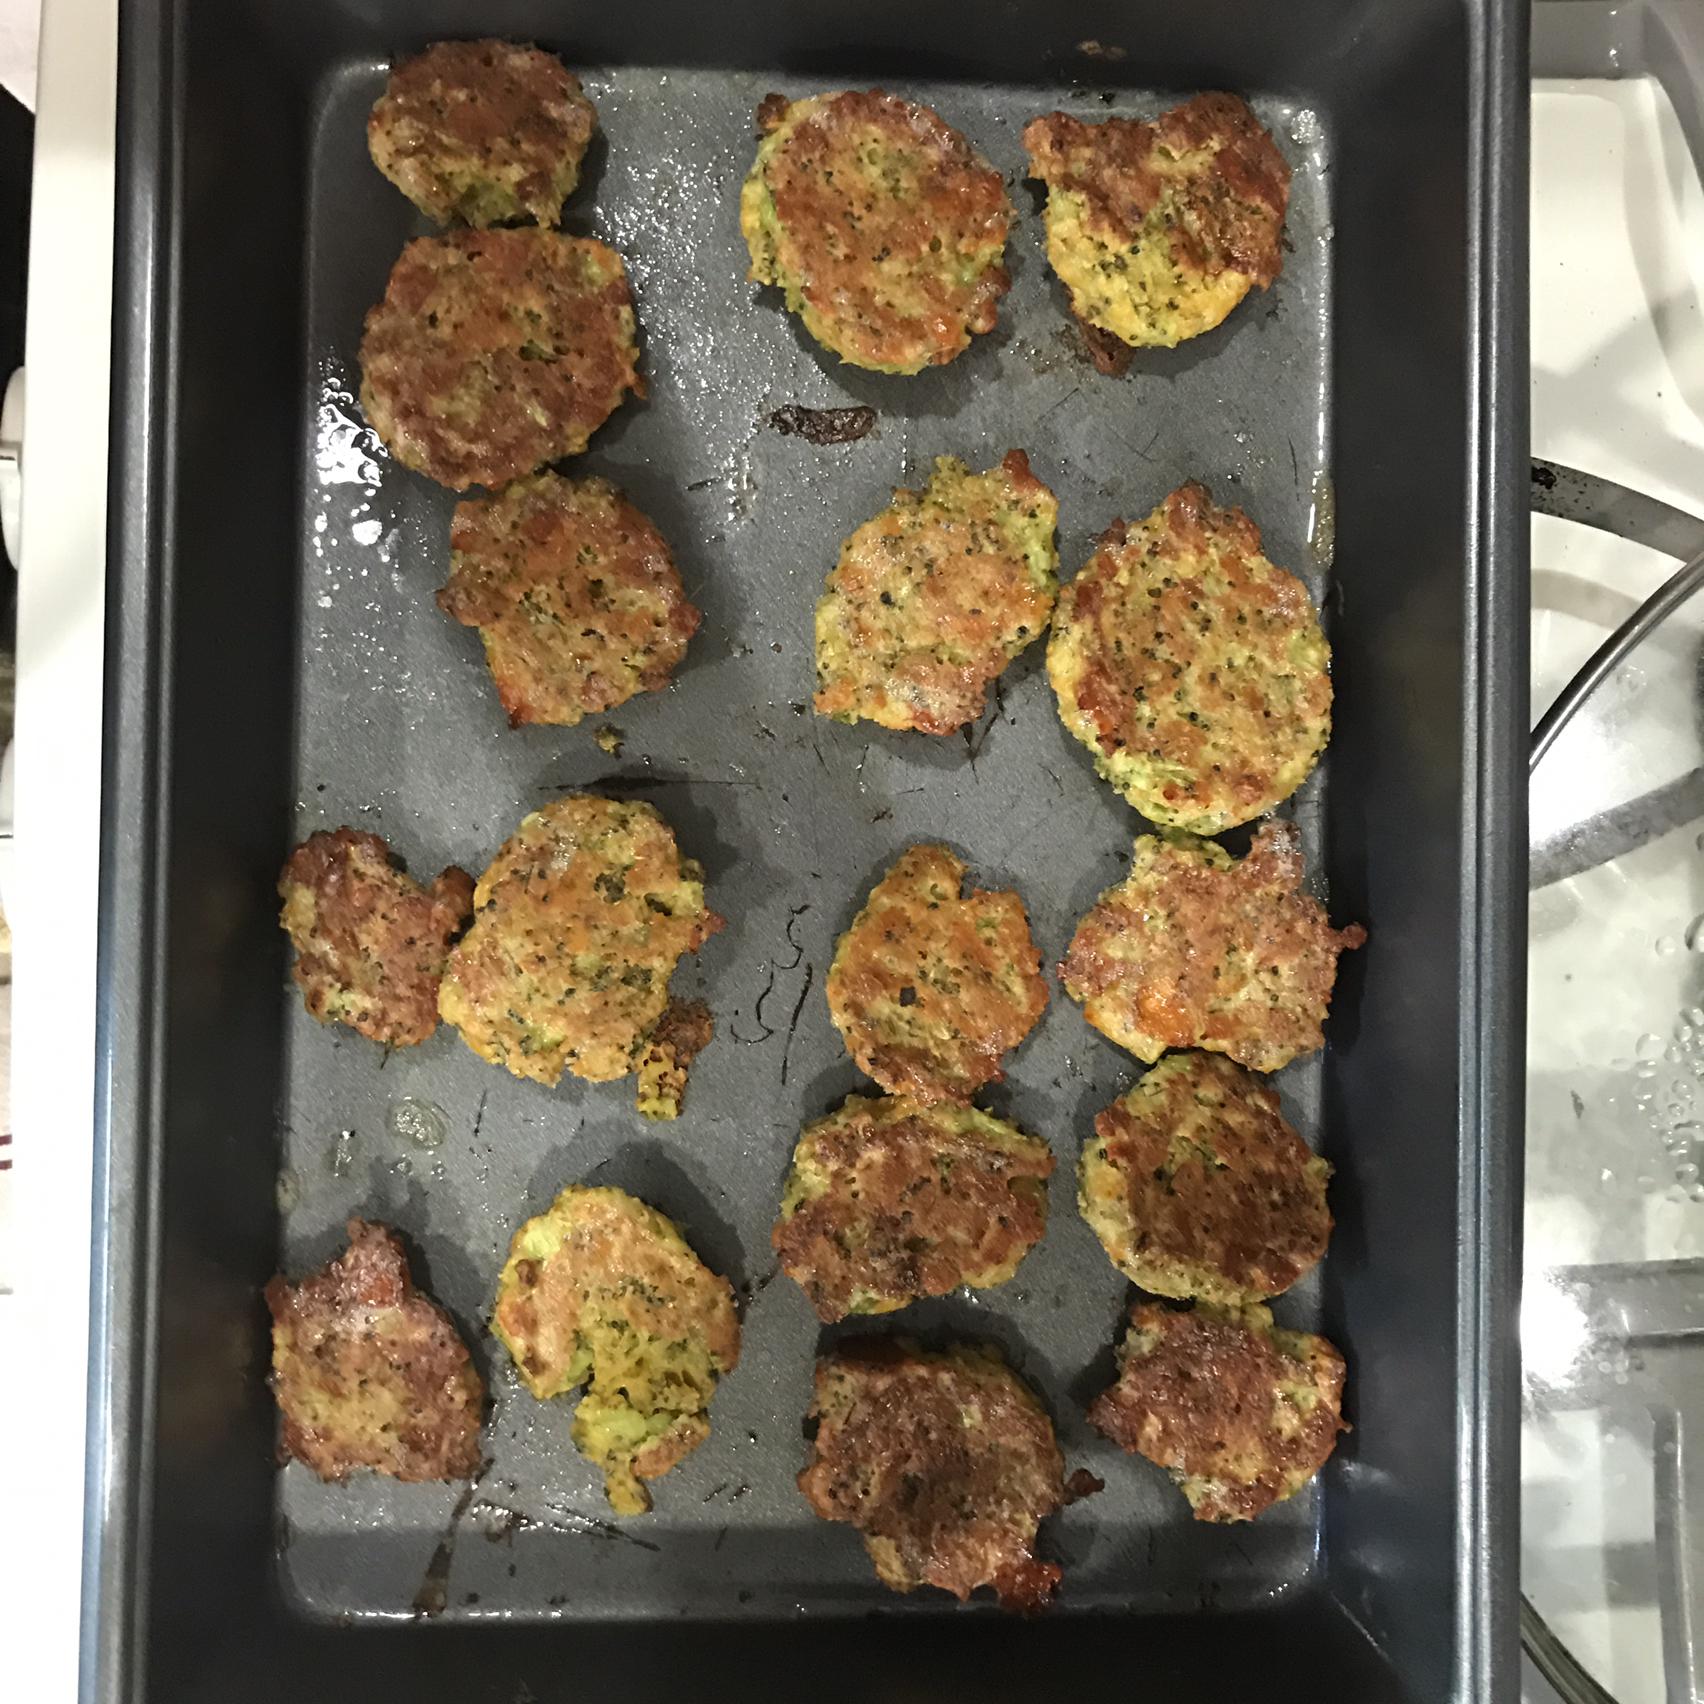 Broccoli and Cheddar Nuggets